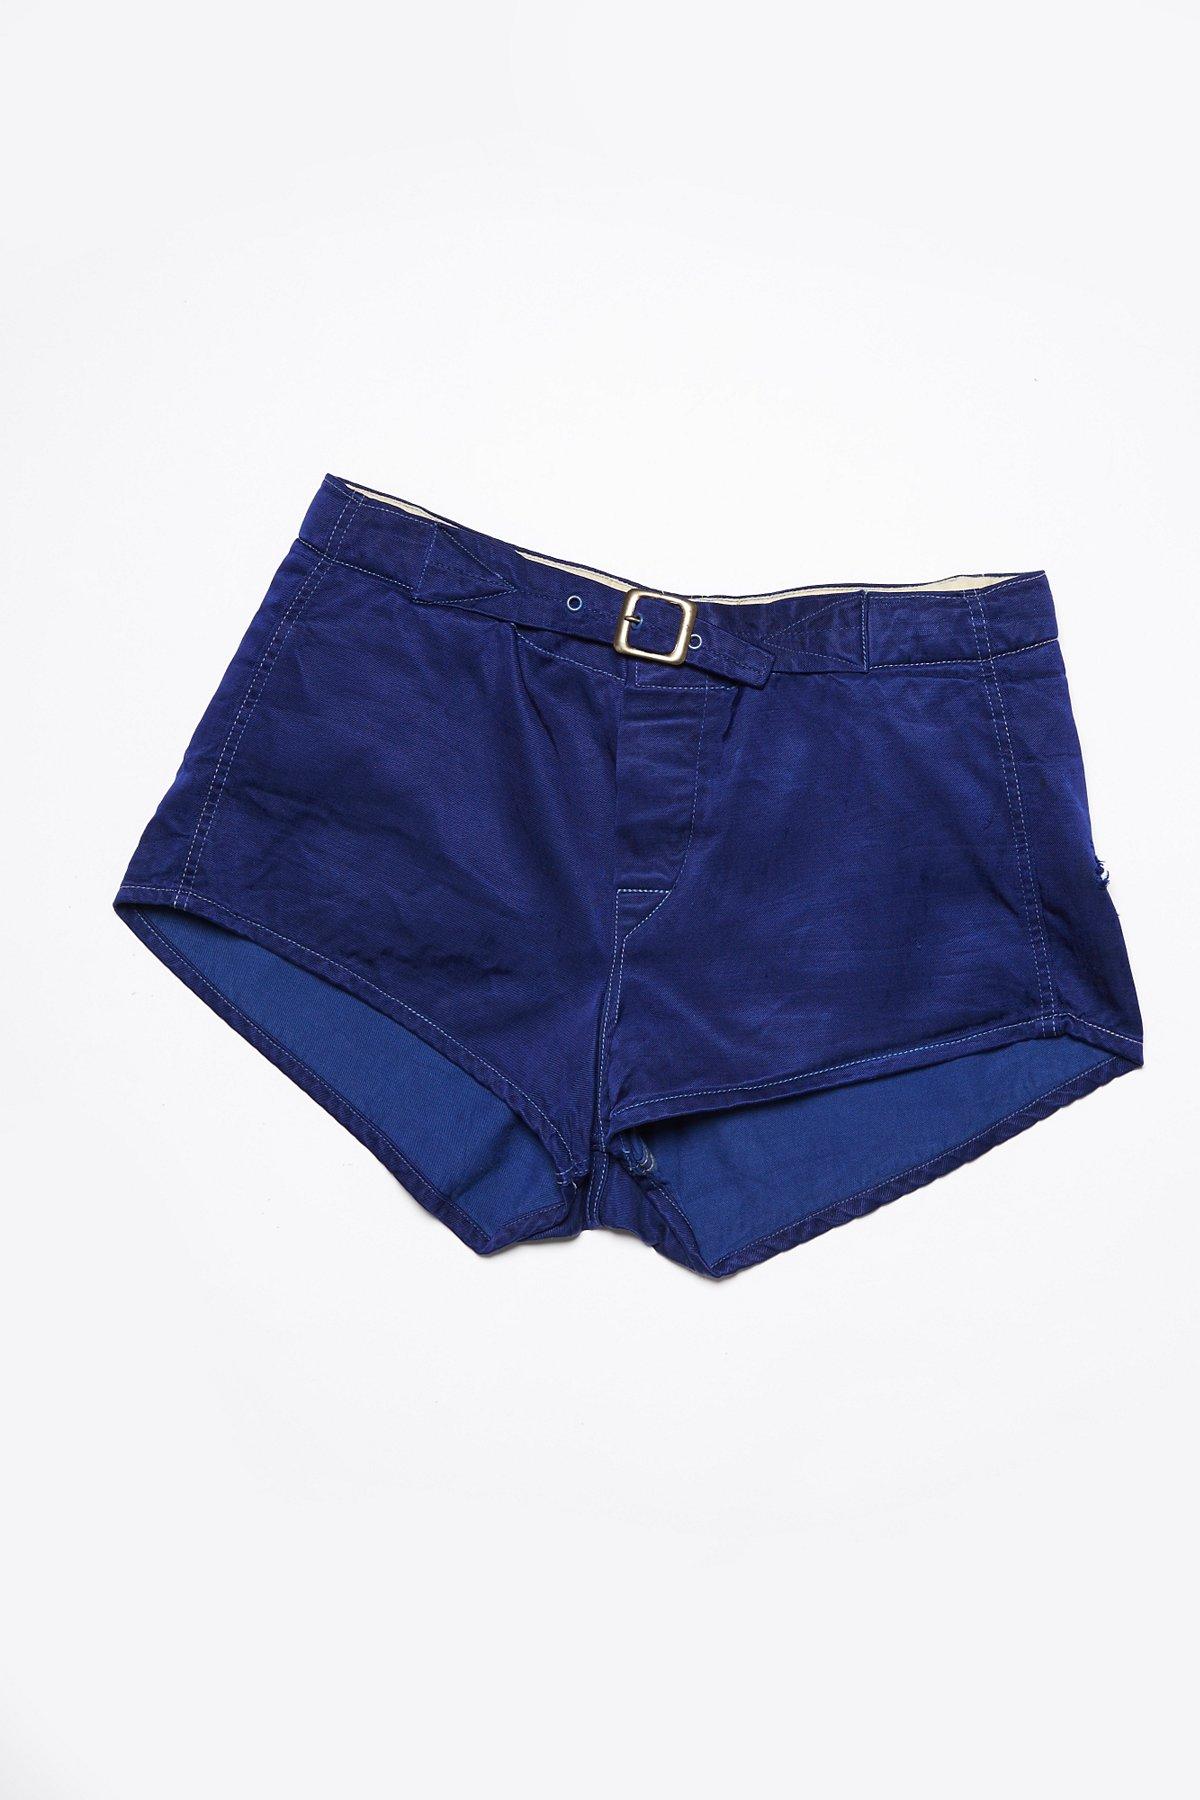 Vintage 1960s Workout Shorts